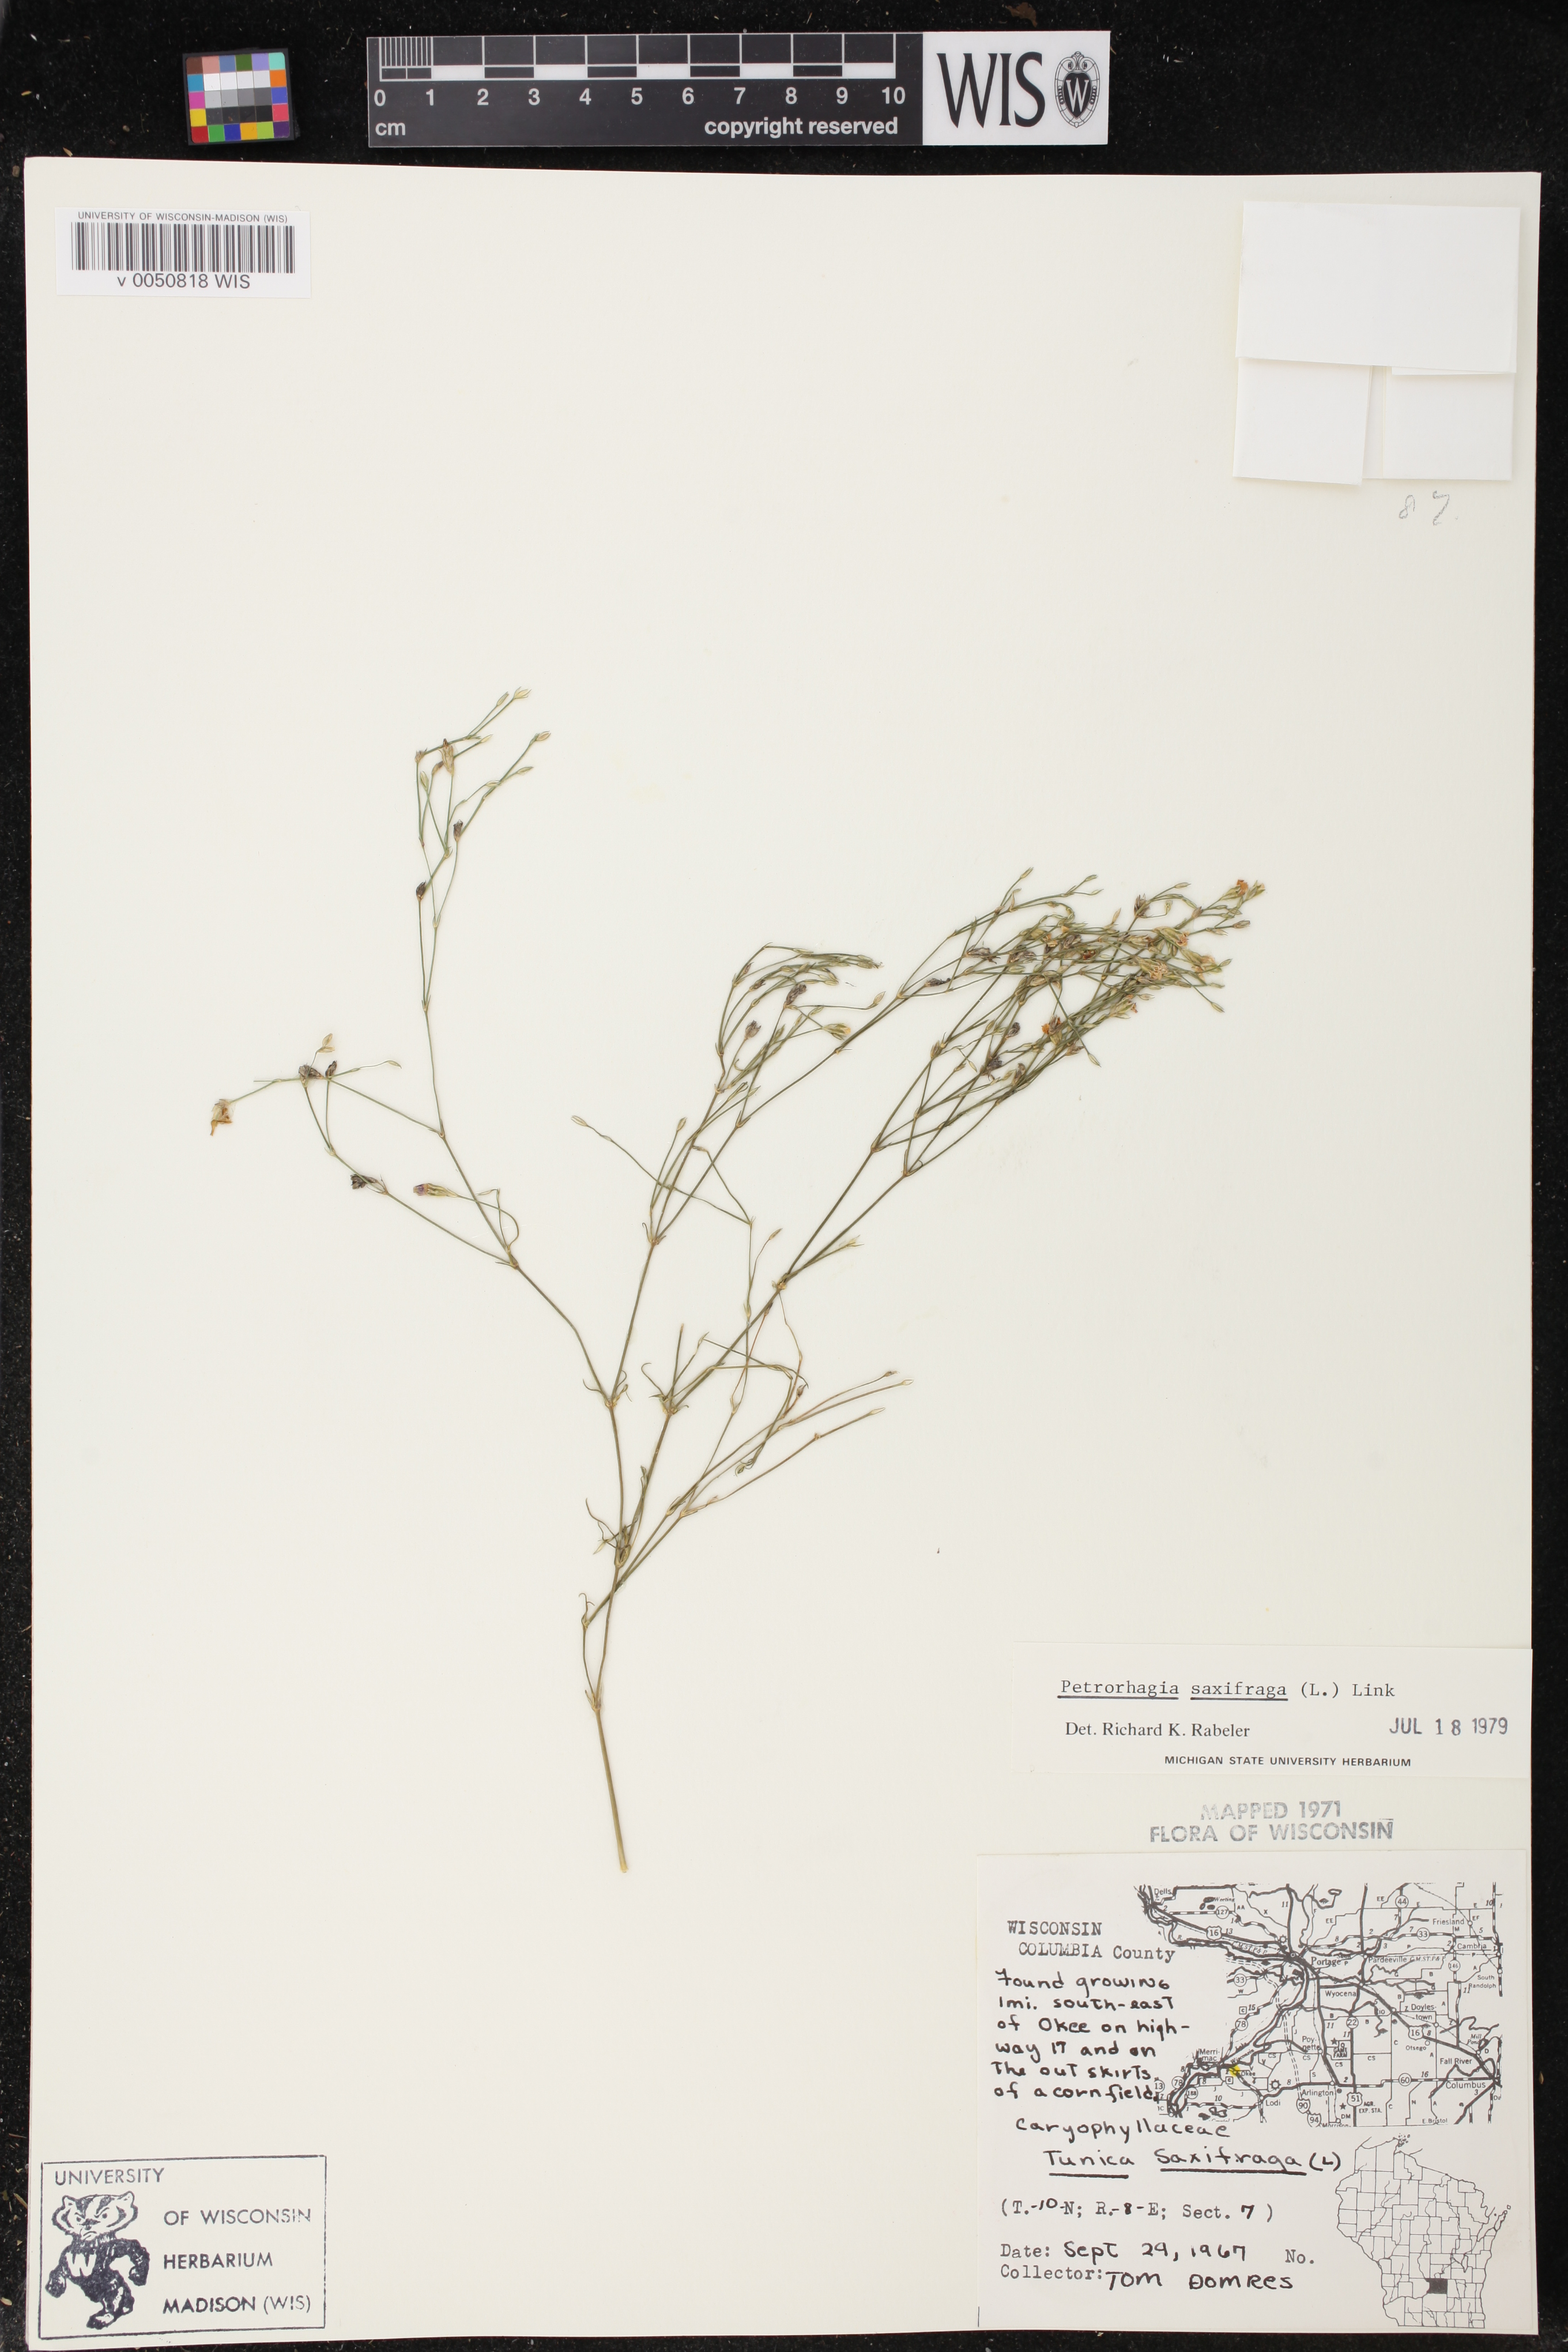 Image of Petrorhagia saxifraga